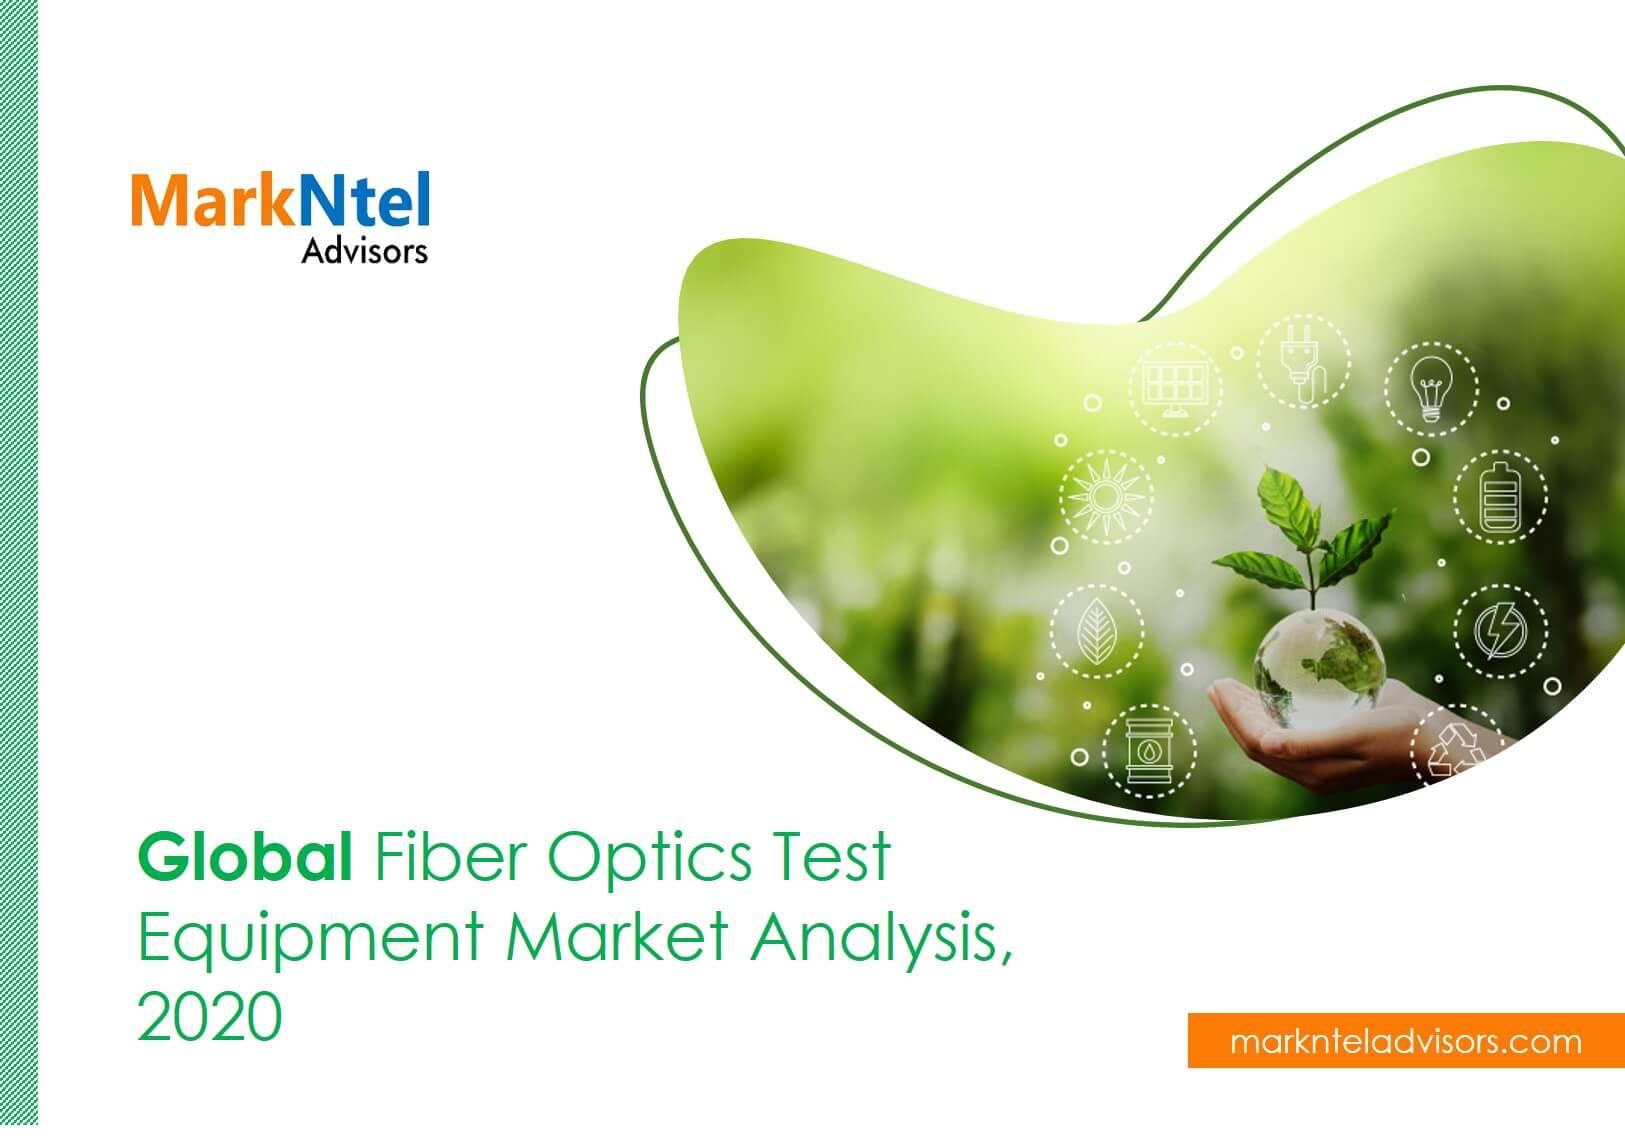 Global Fiber Optic Test Equipment Market Analysis, 2020